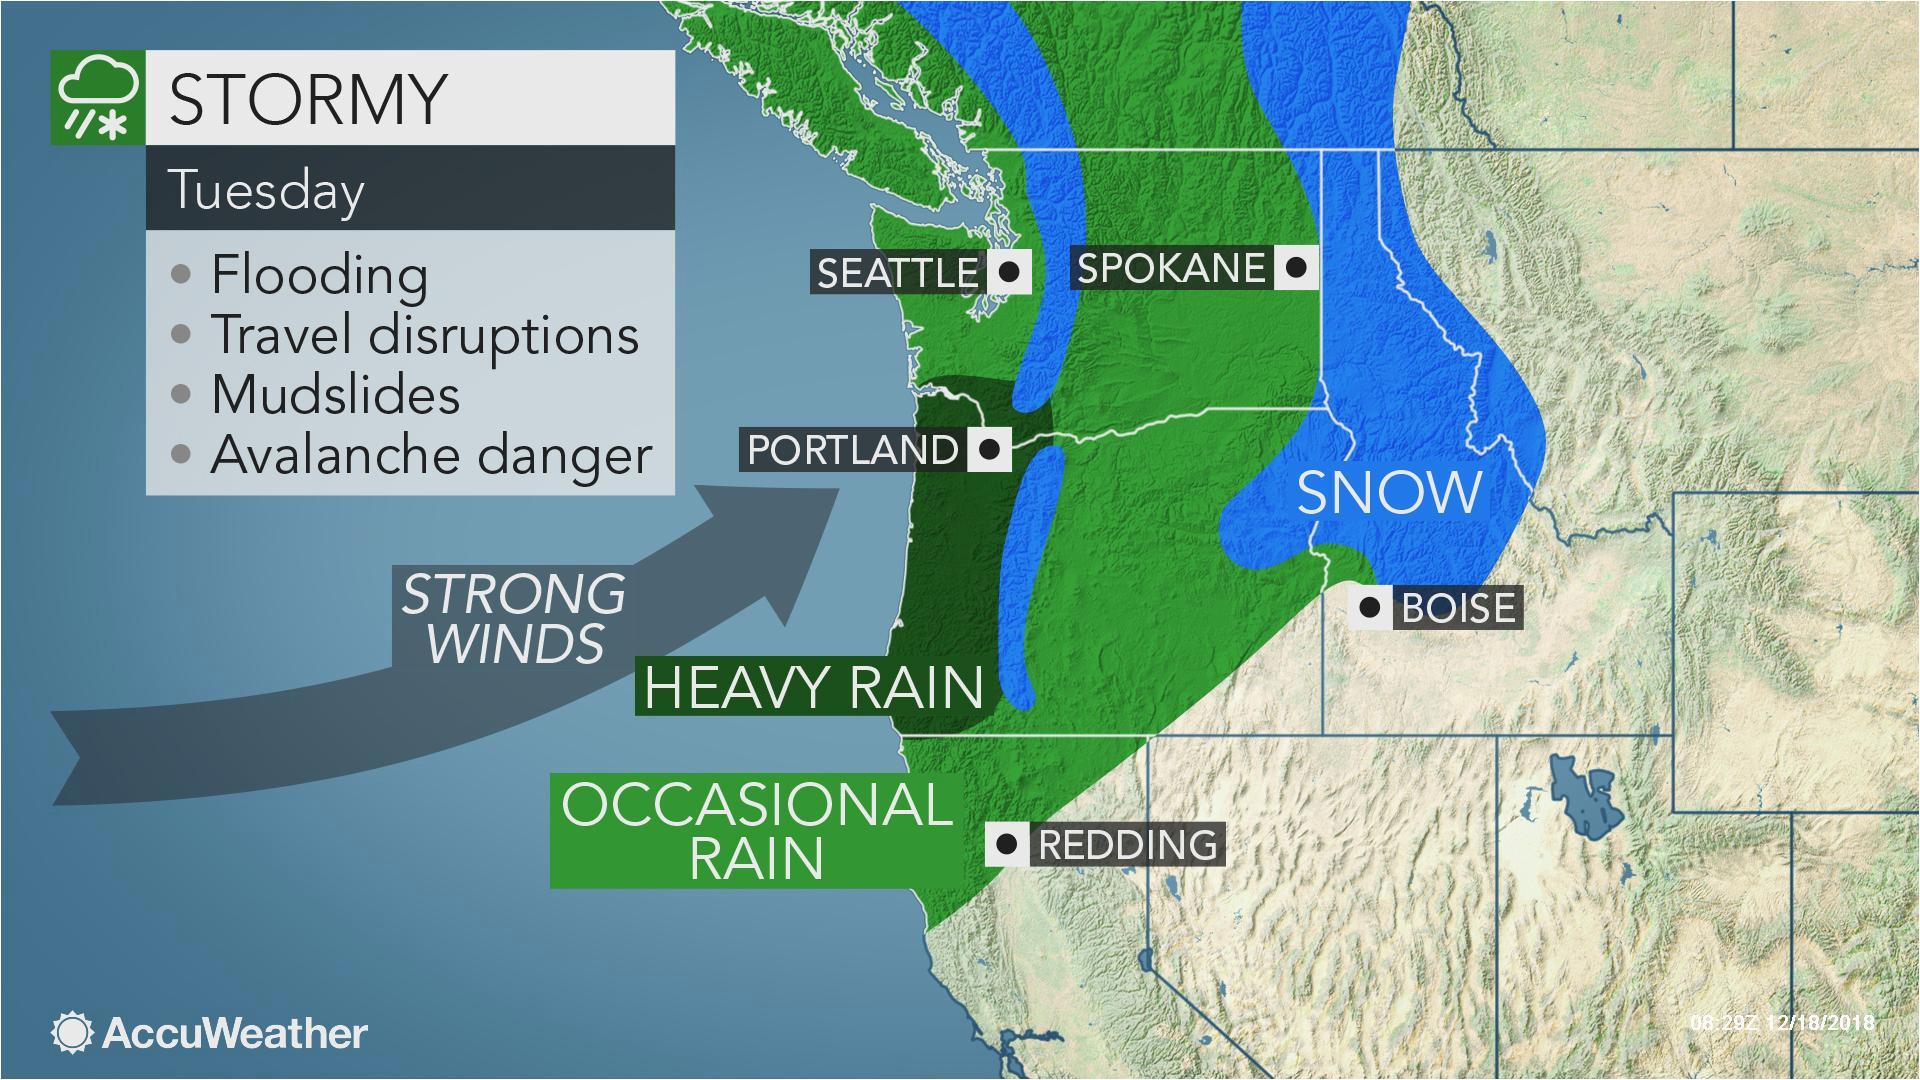 Enterprise oregon Map Early Week Storm May Be Strongest yet This Season In northwestern Us